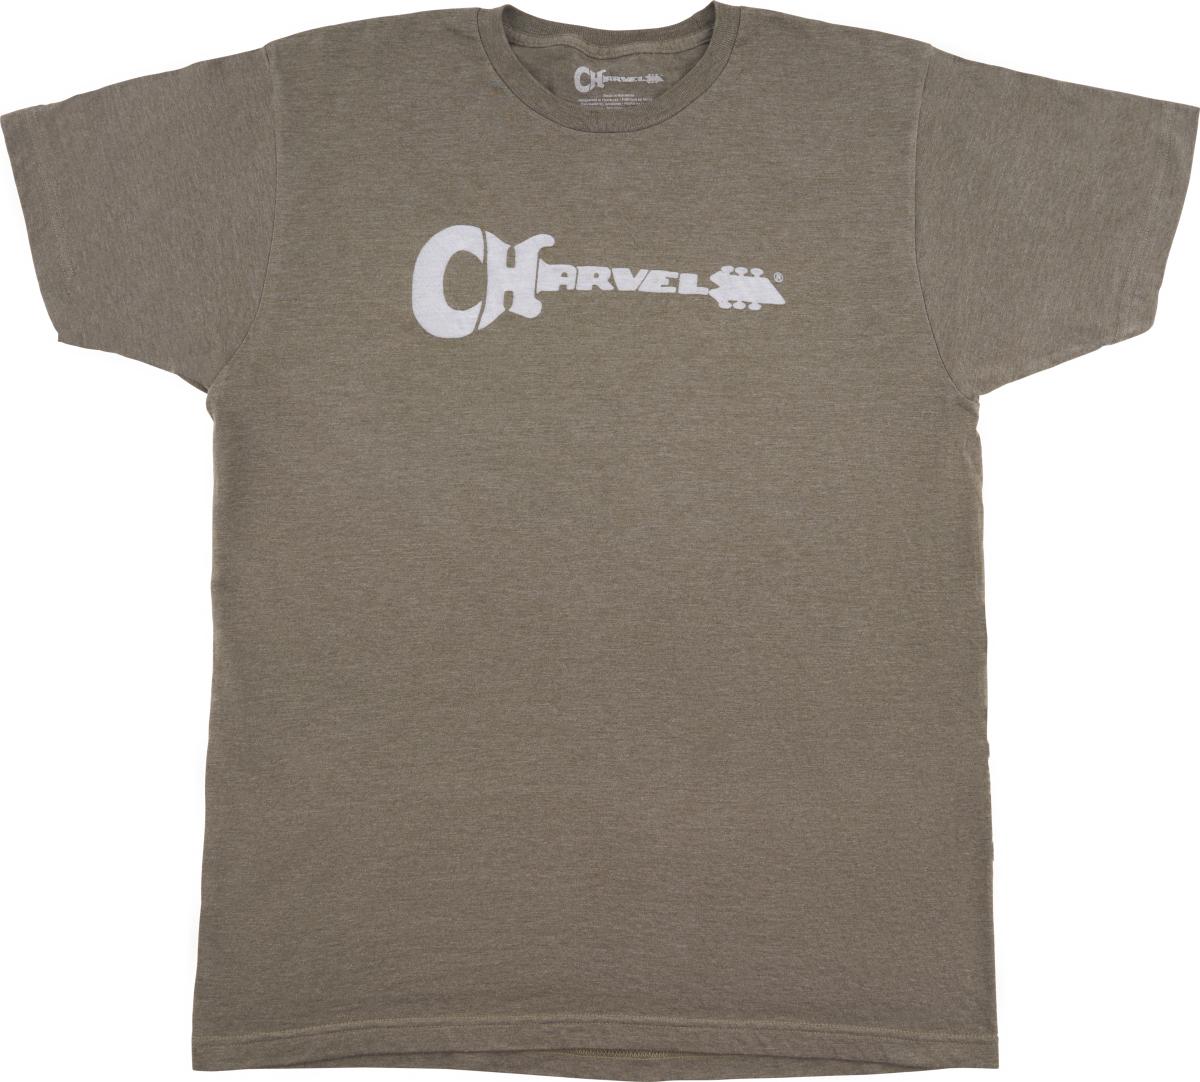 Charvel Charvel® Guitar Logo T-Shirt, Heather Green, M